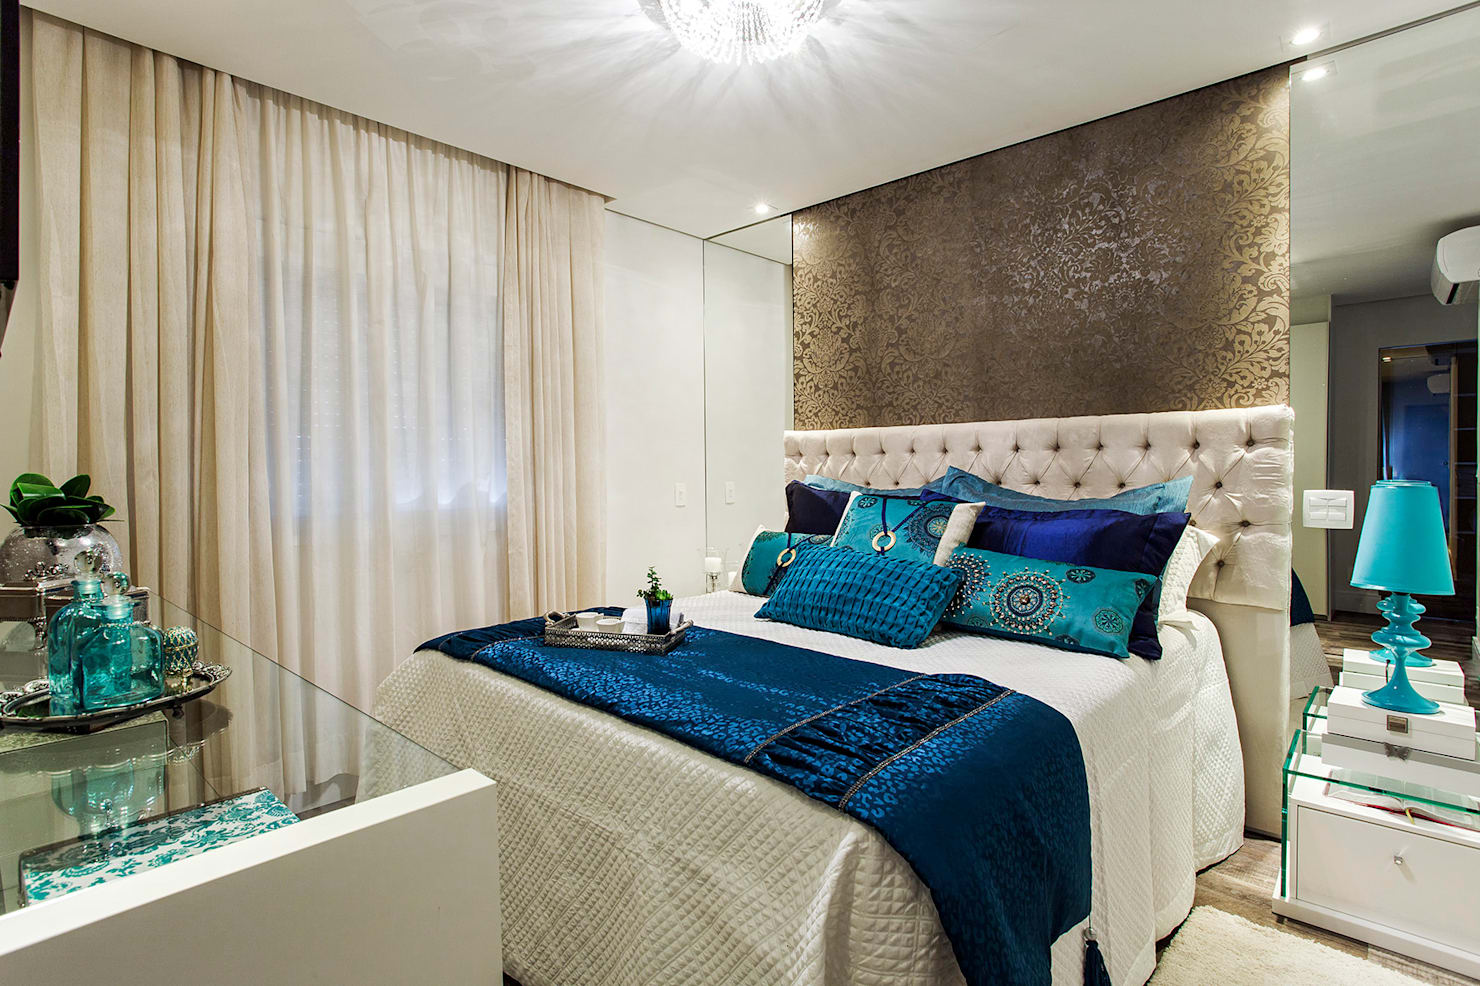 Bedroom Design Ideas - cover